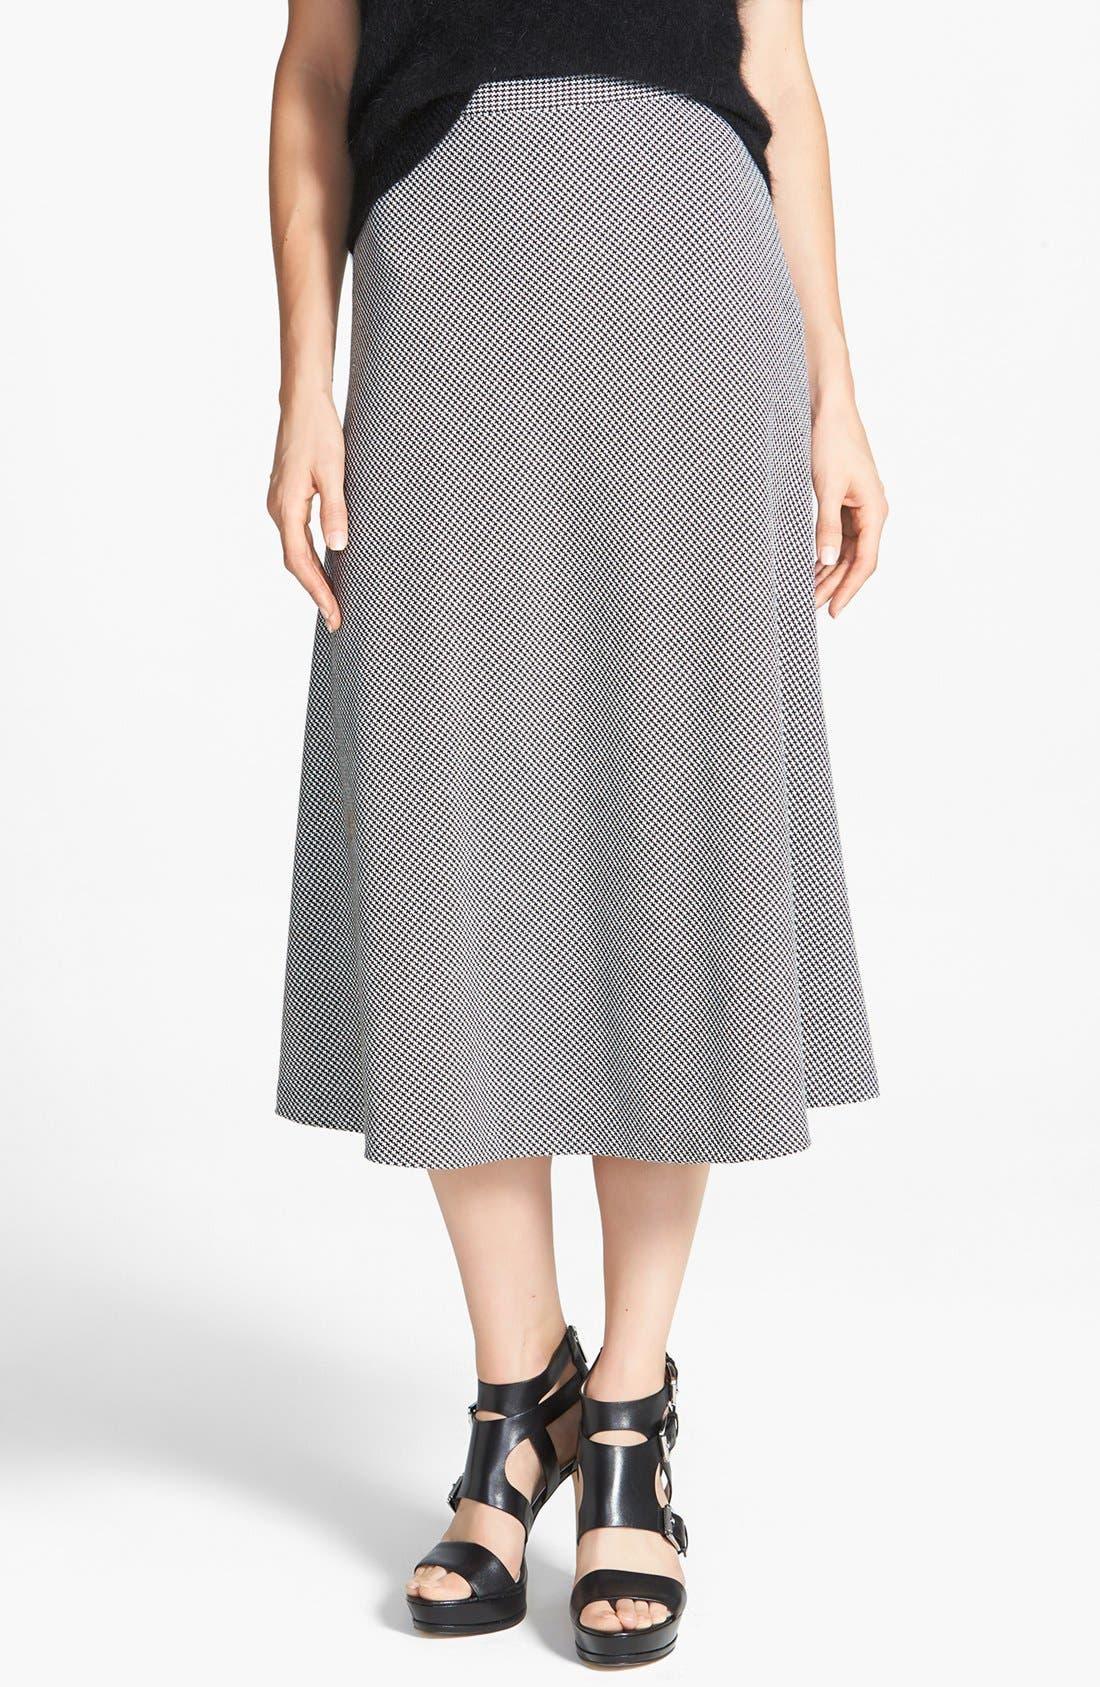 Alternate Image 1 Selected - MICHAEL Michael Kors Houndstooth Circle Skirt